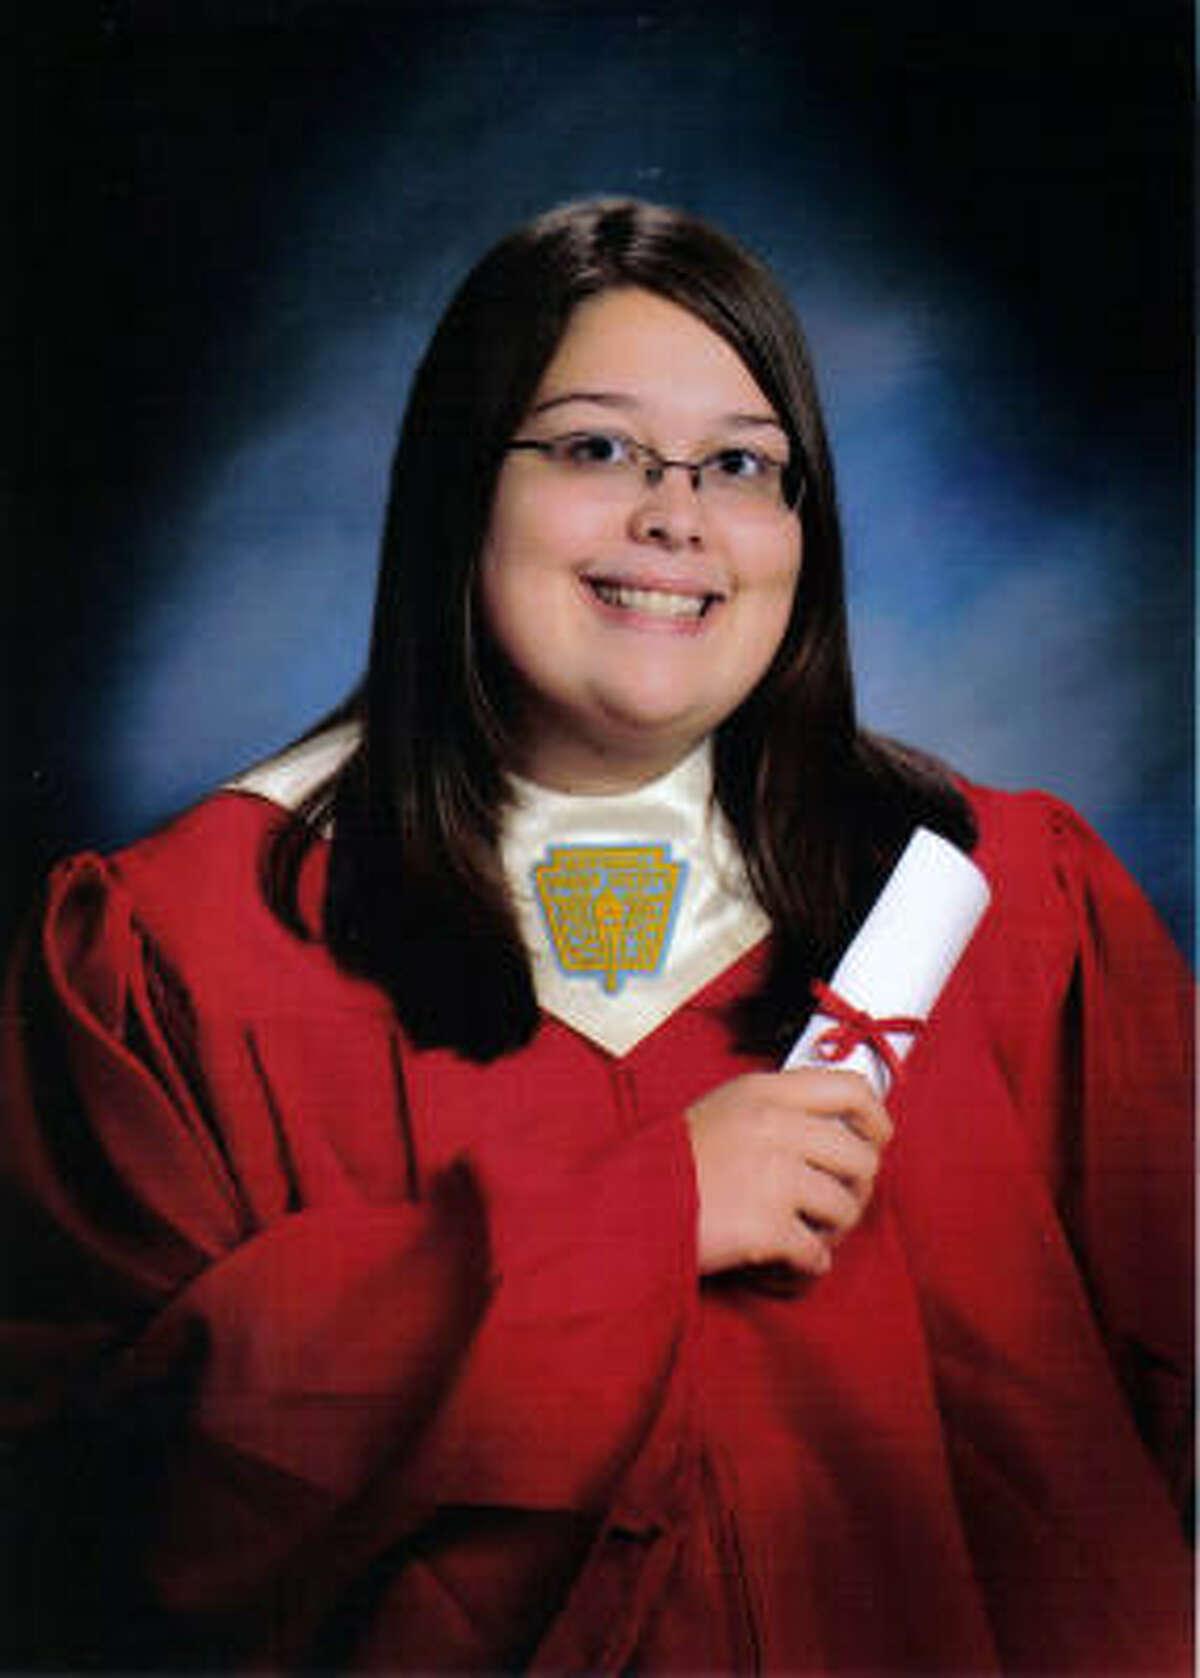 Kayla Brianne Springer Caney Creek High School Valedictorian College: University of Texas at Dallas